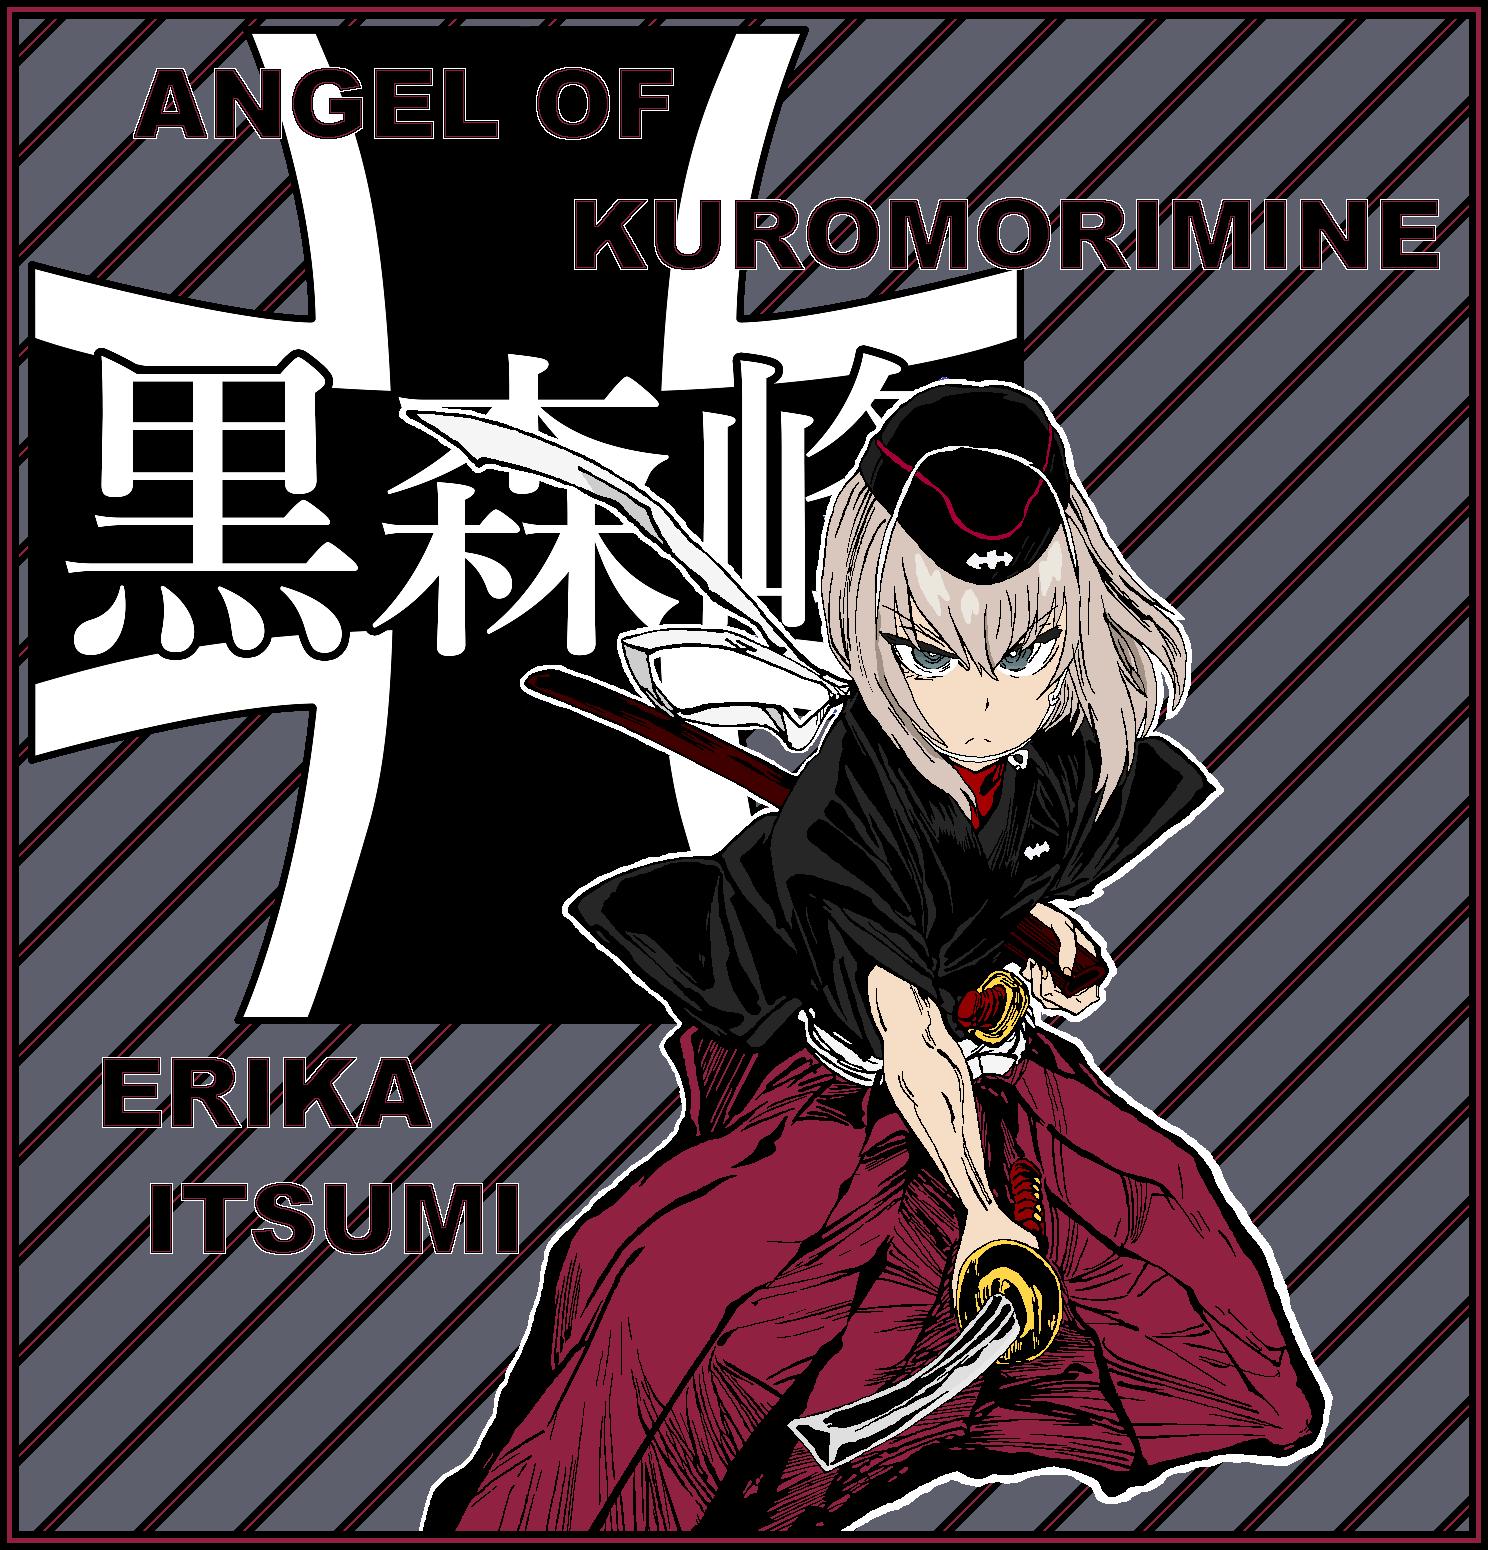 Erika Itsumi Angel Kuromorimine 2 by mirage2000